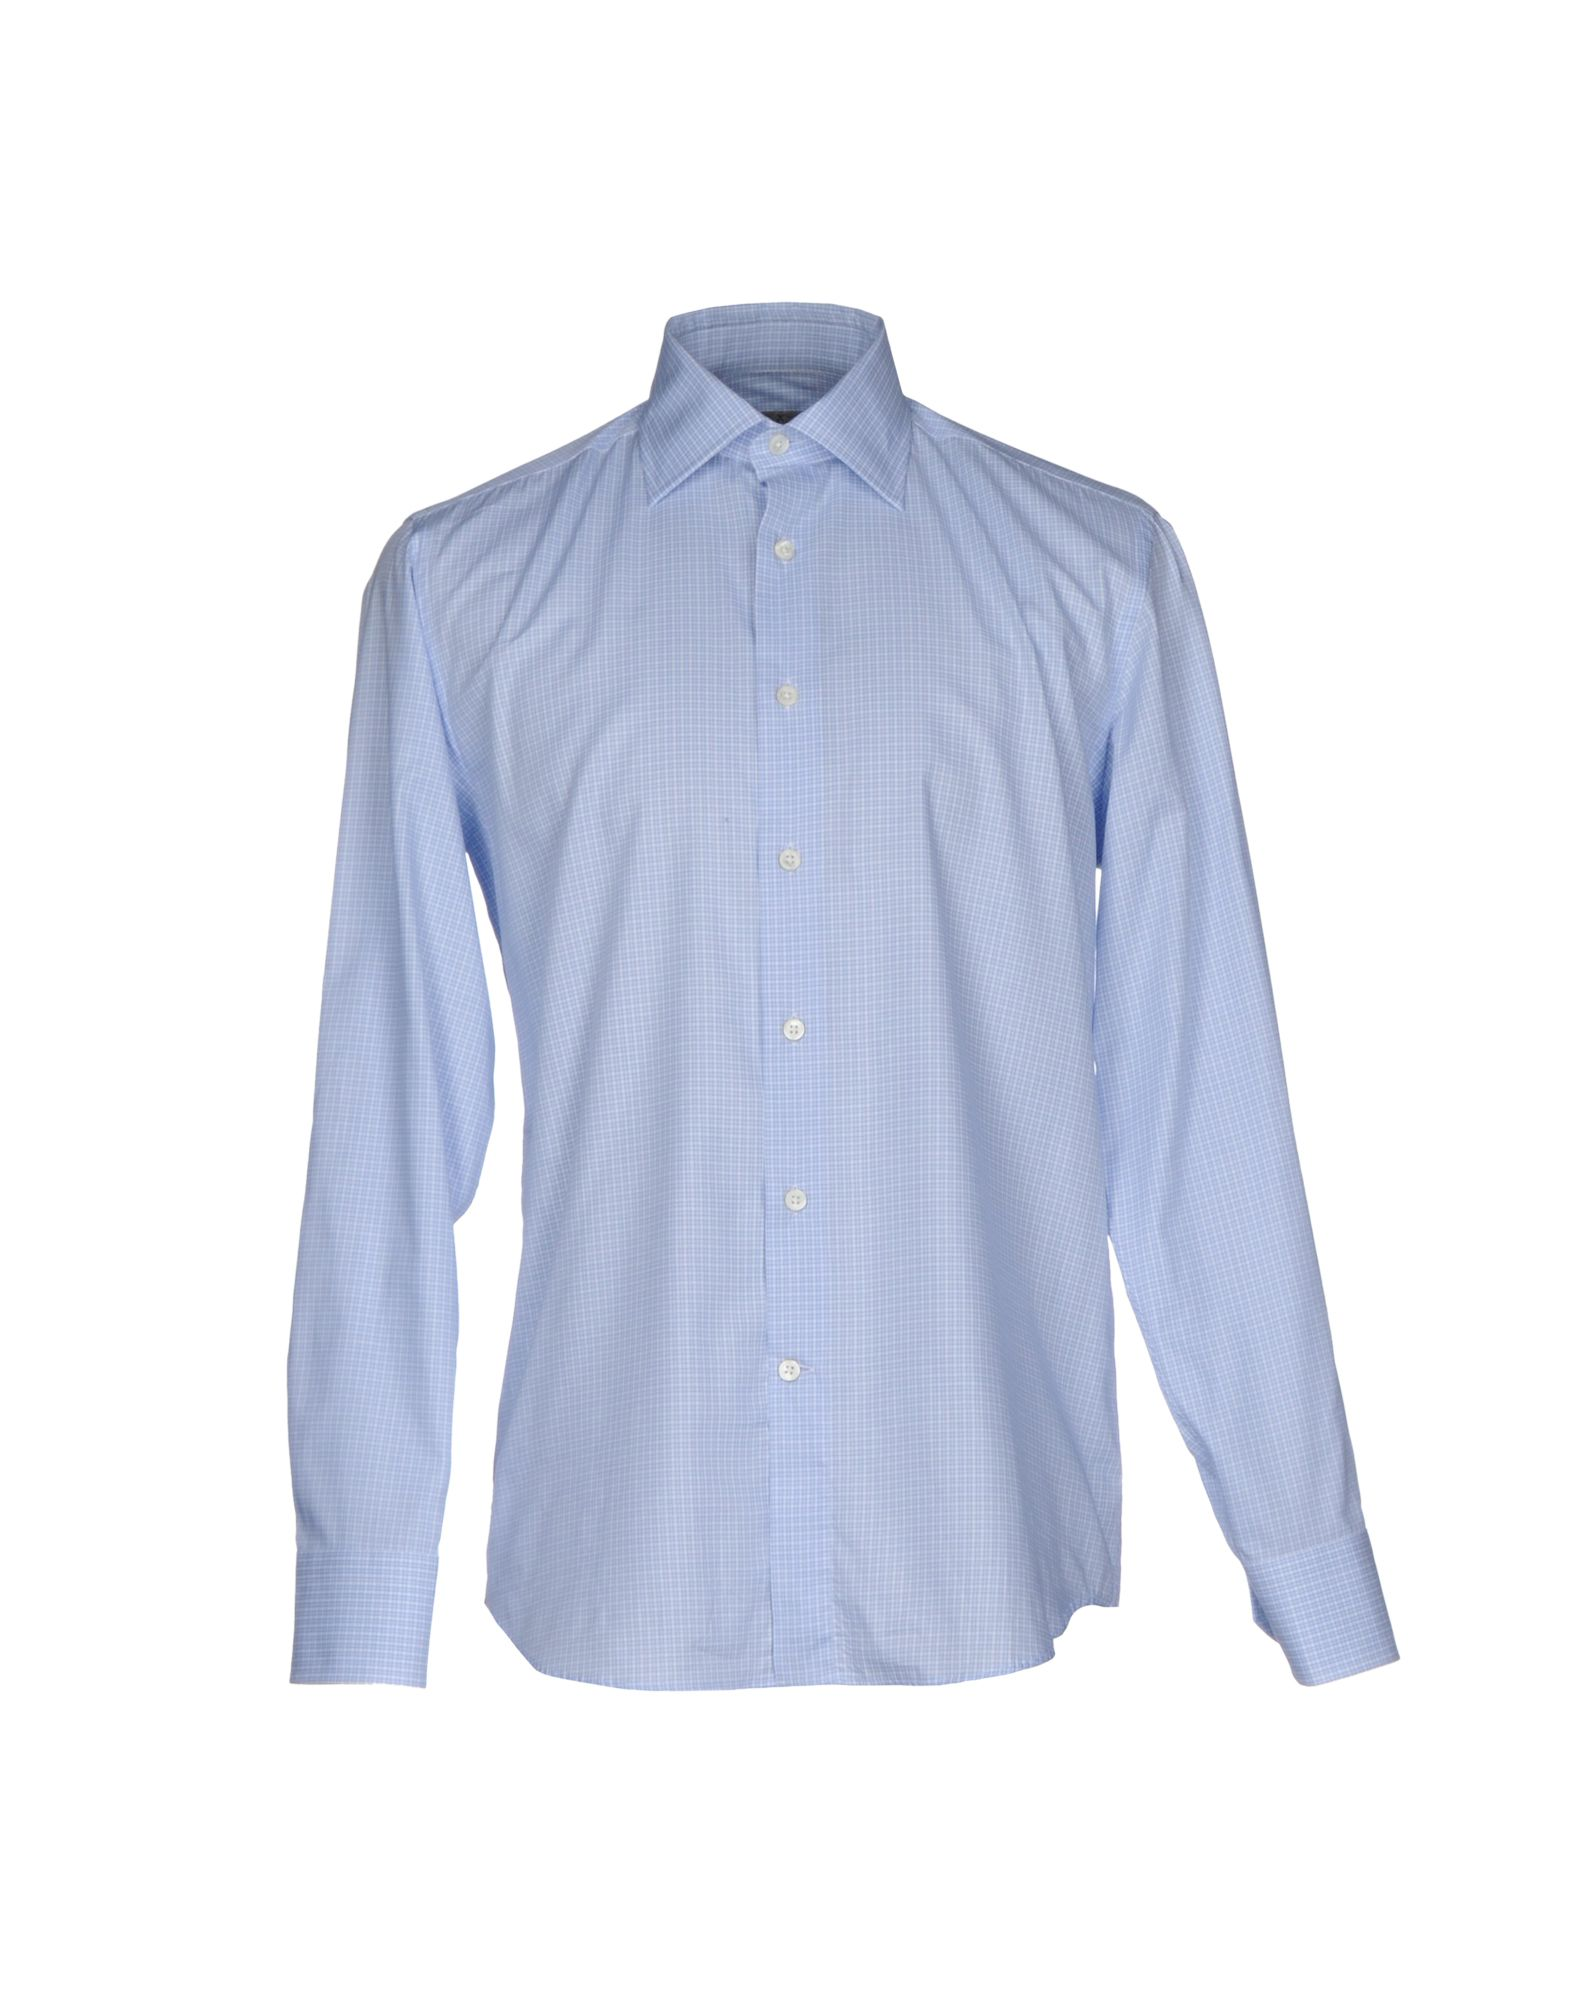 CANALI Herren Hemd Farbe Himmelblau Größe 7